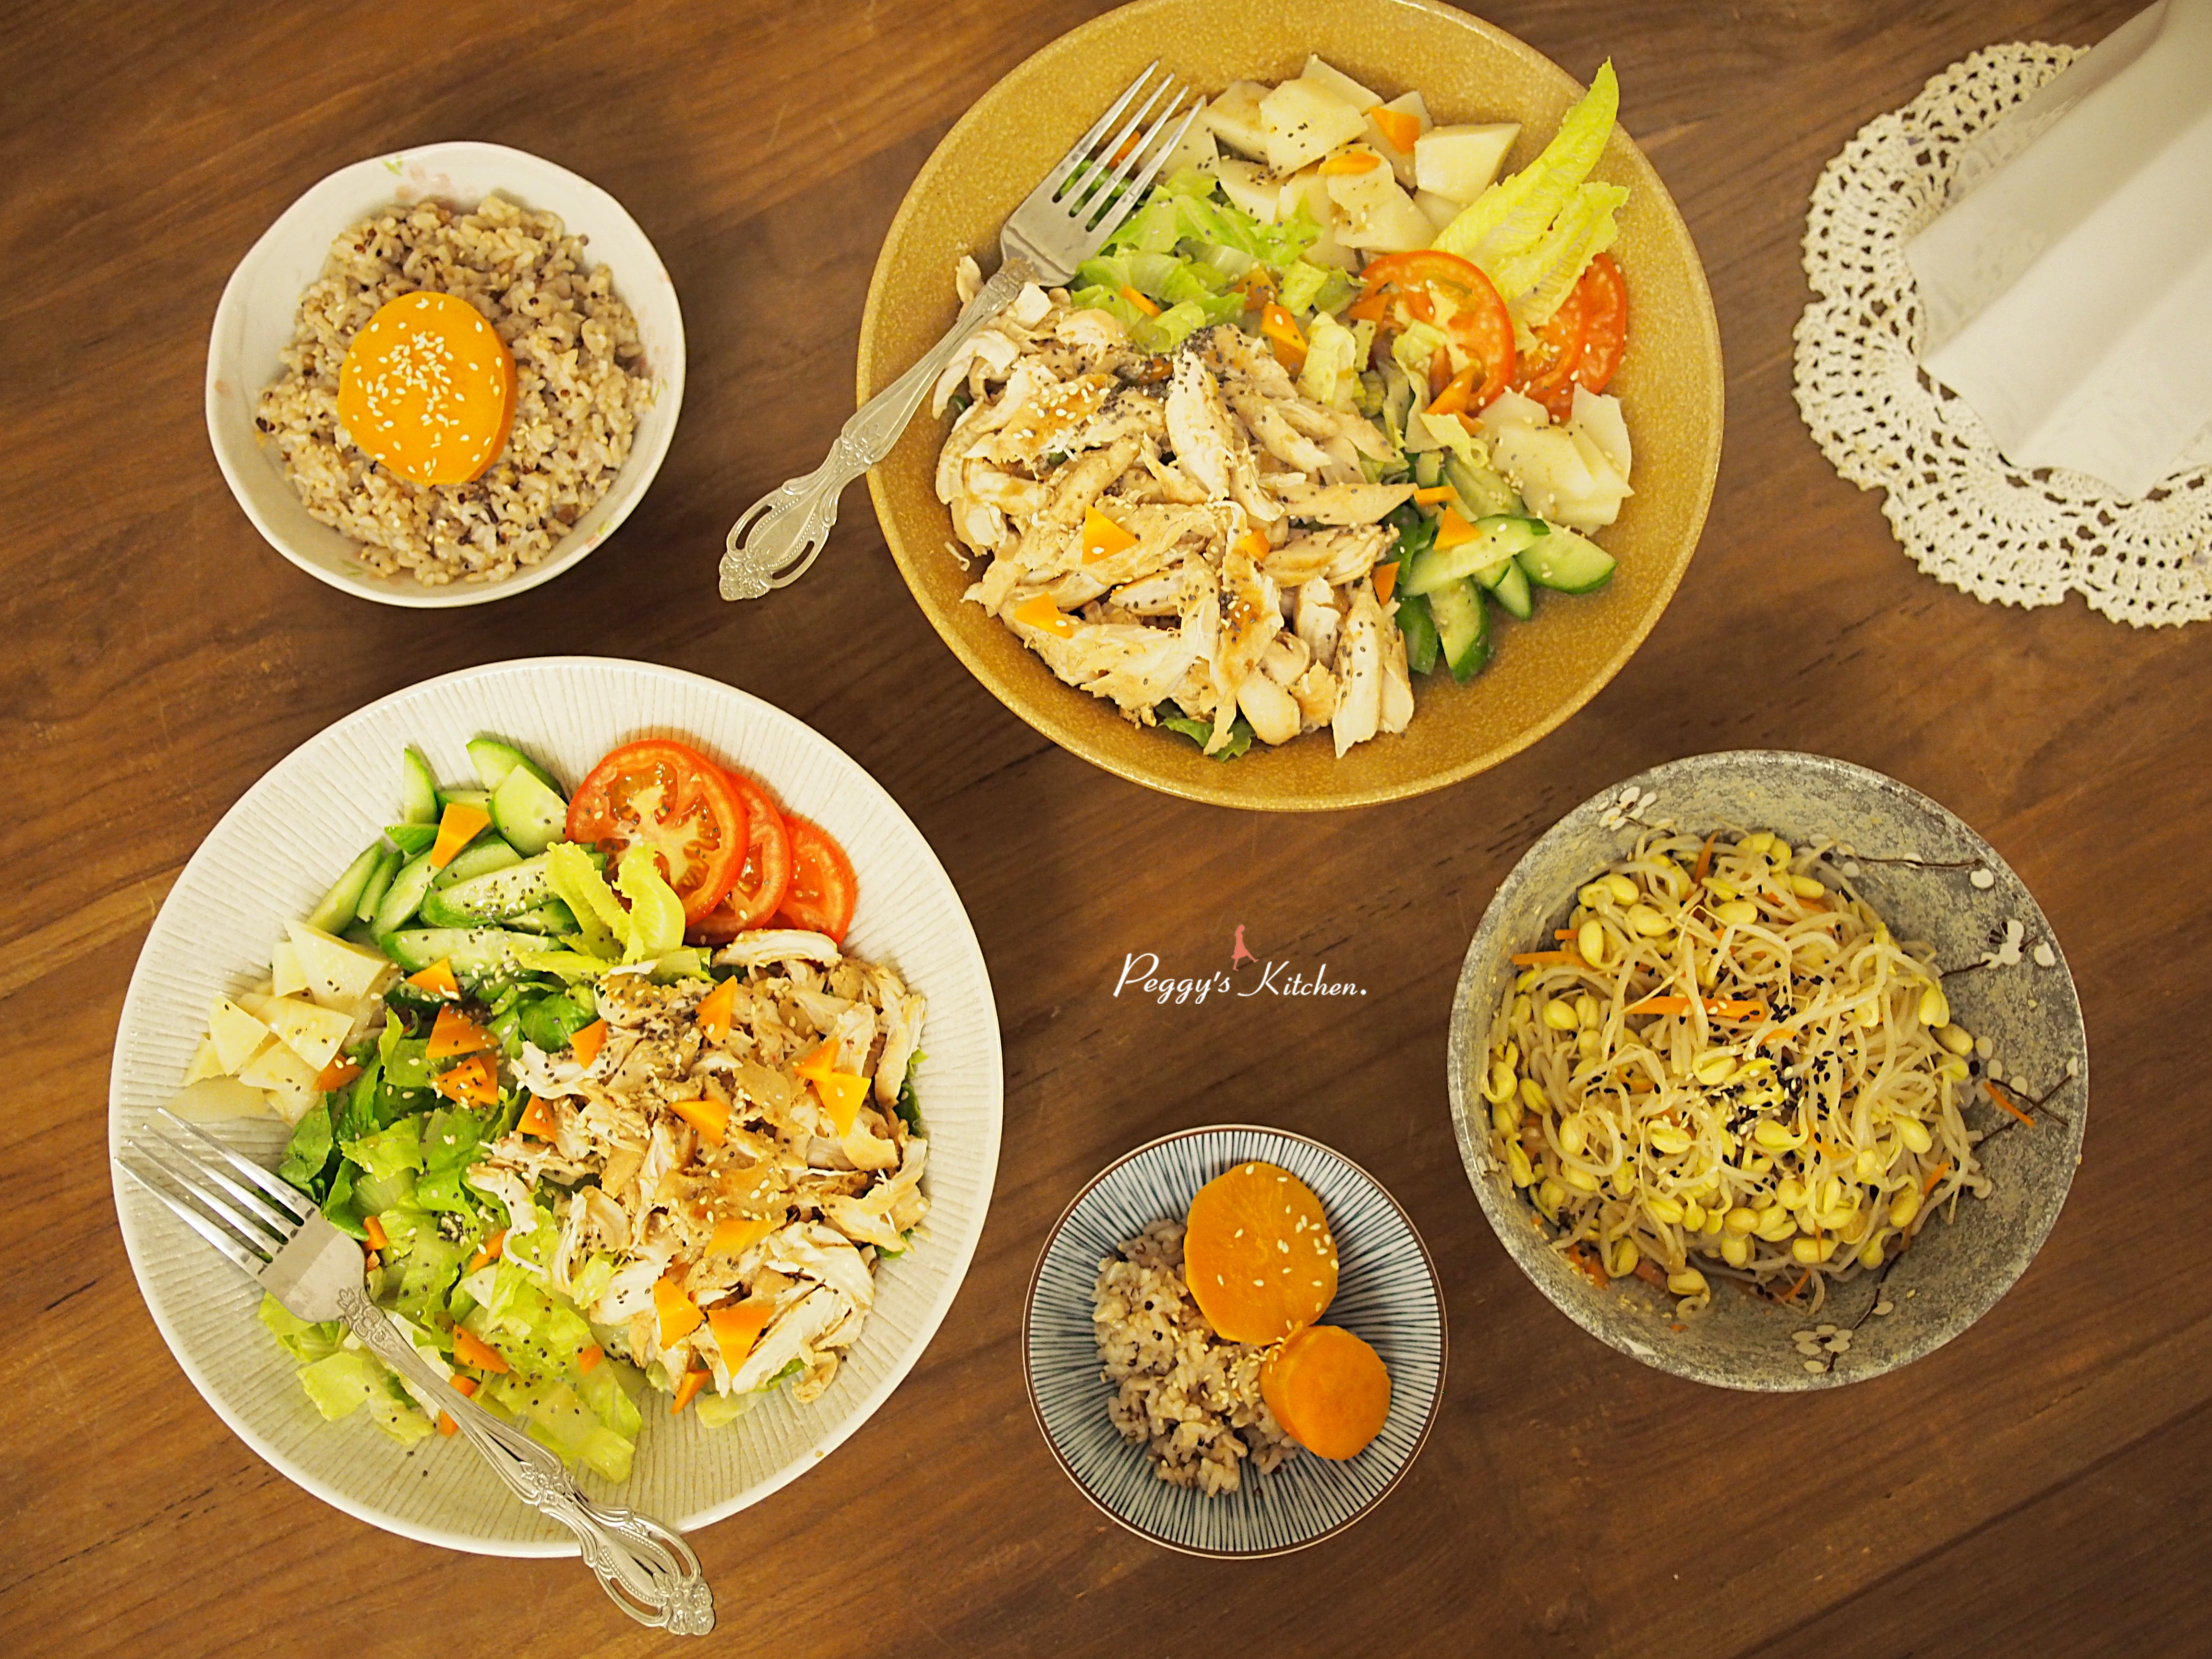 《Peggy廚房》香煎雞柳鮮蔬沙拉